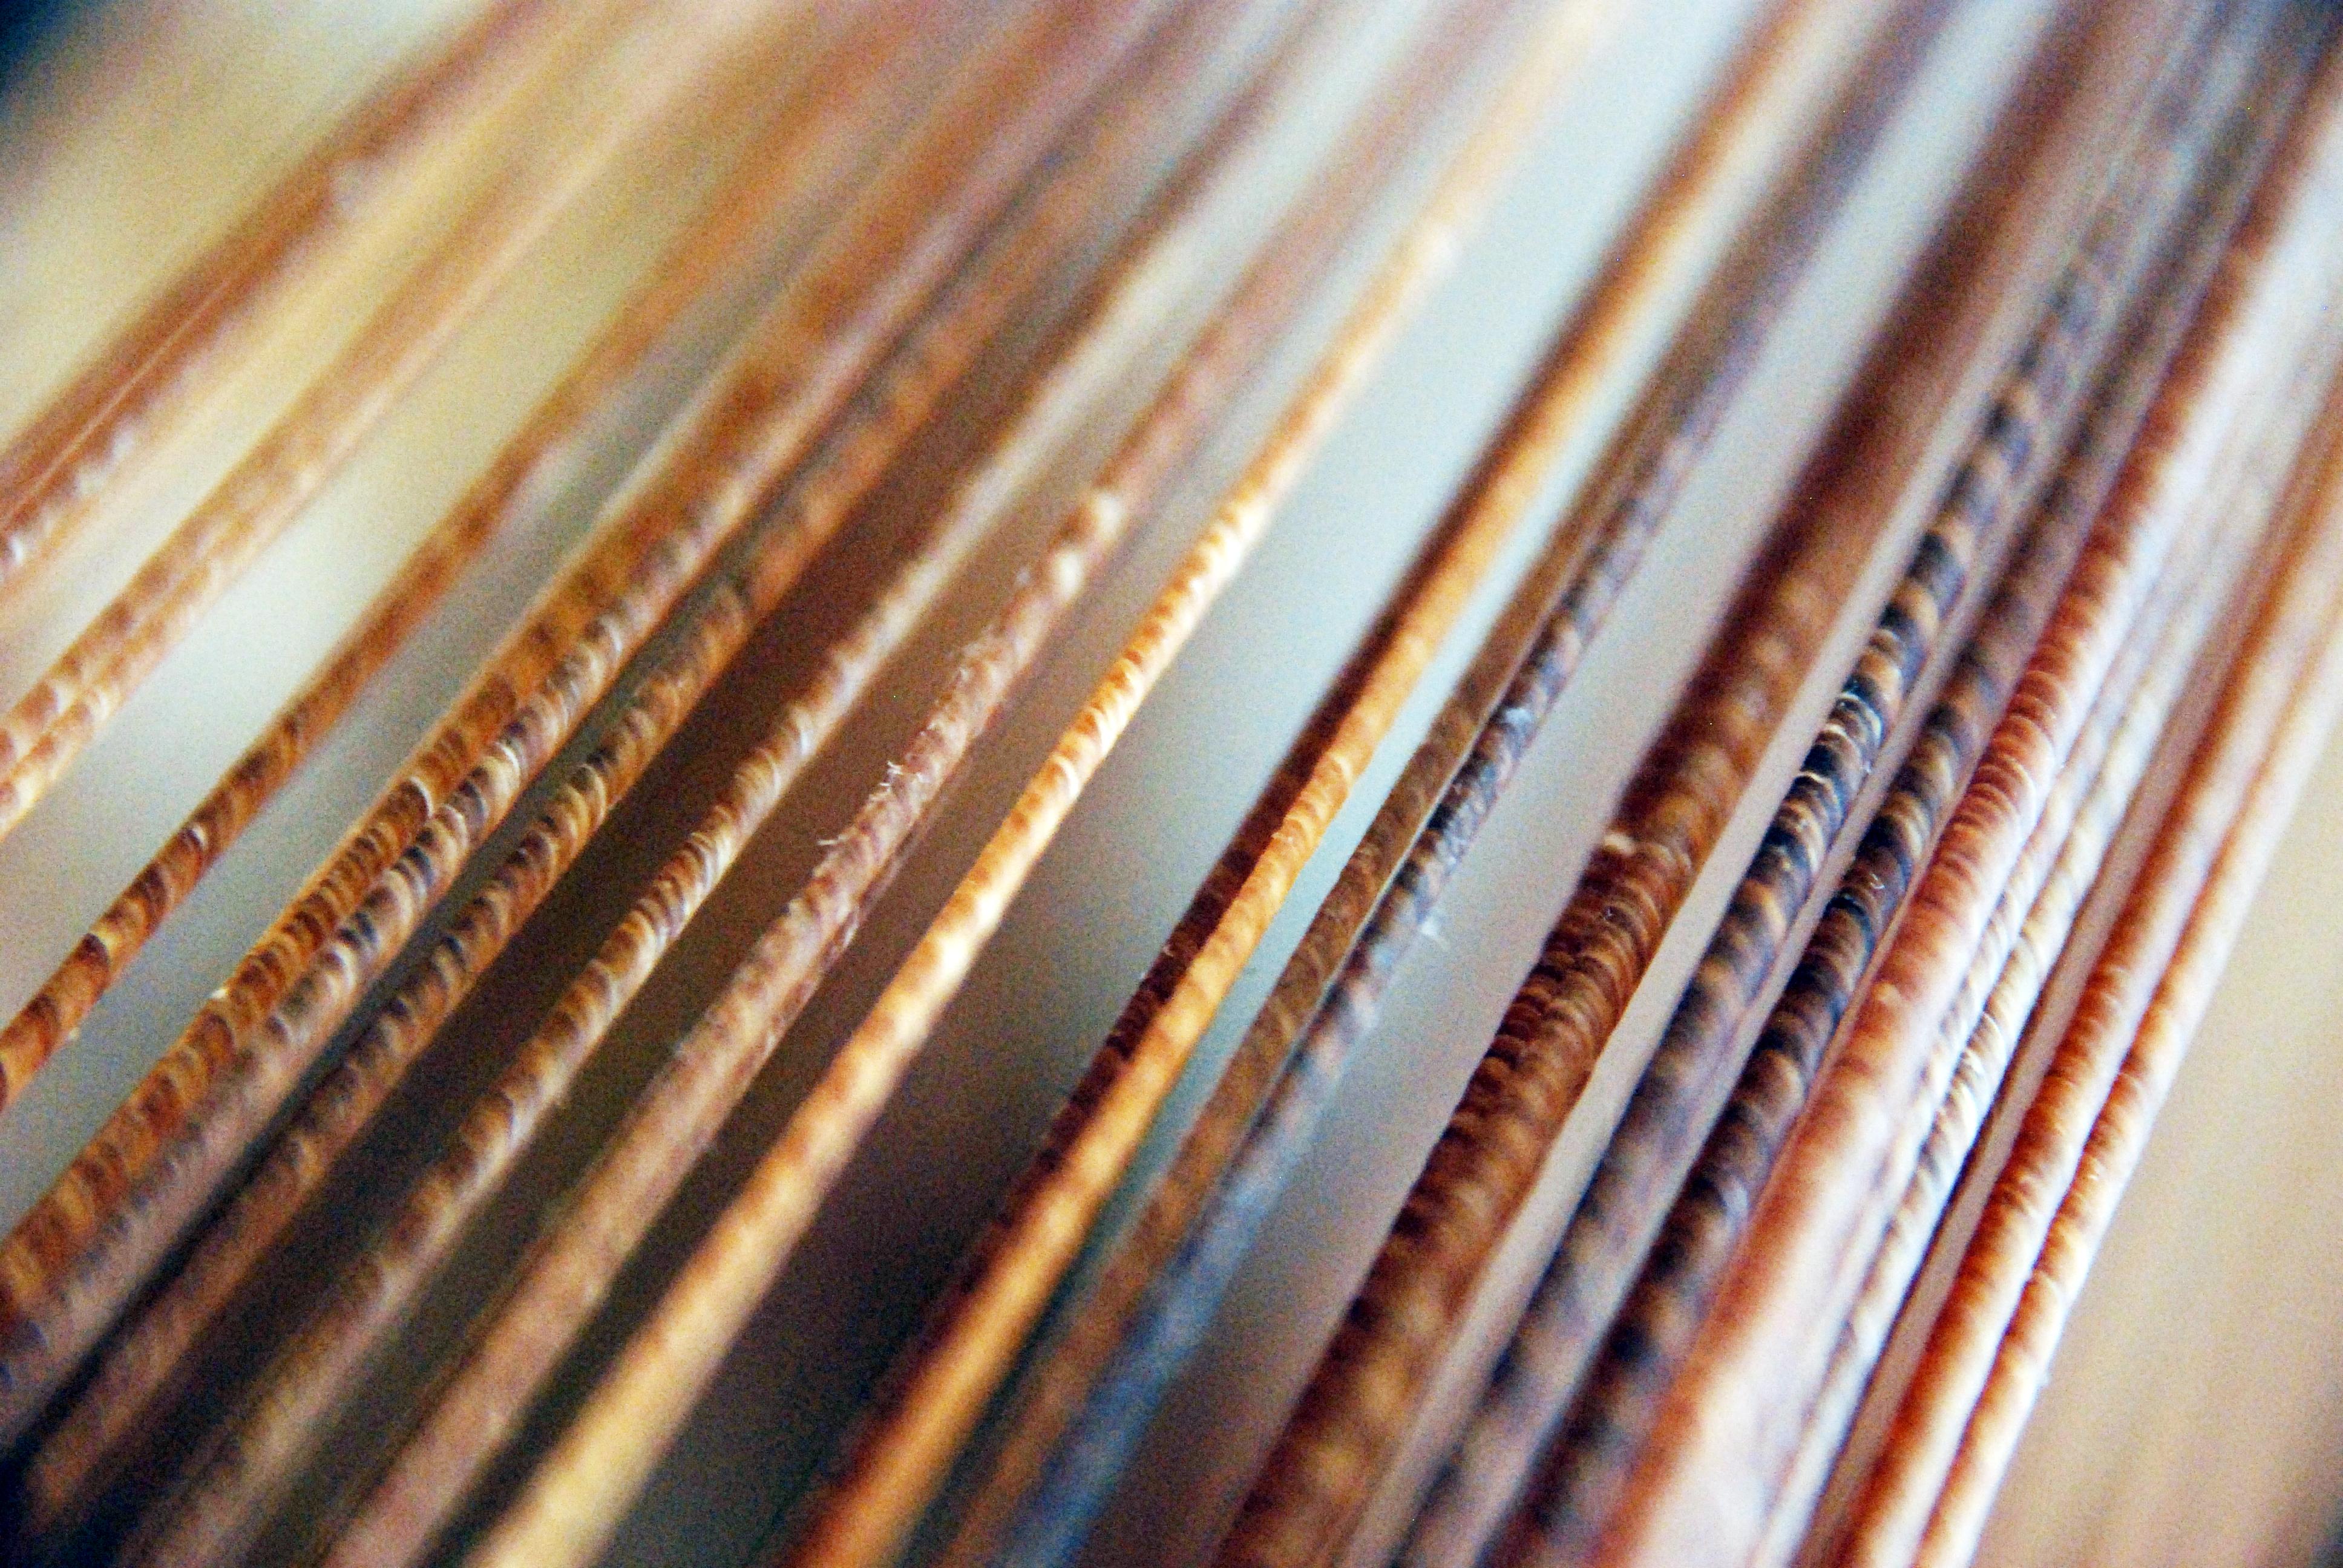 Pure Corde, Darmsaiten, fine gut strings, Saitenmacher, Saitenmanufaktur